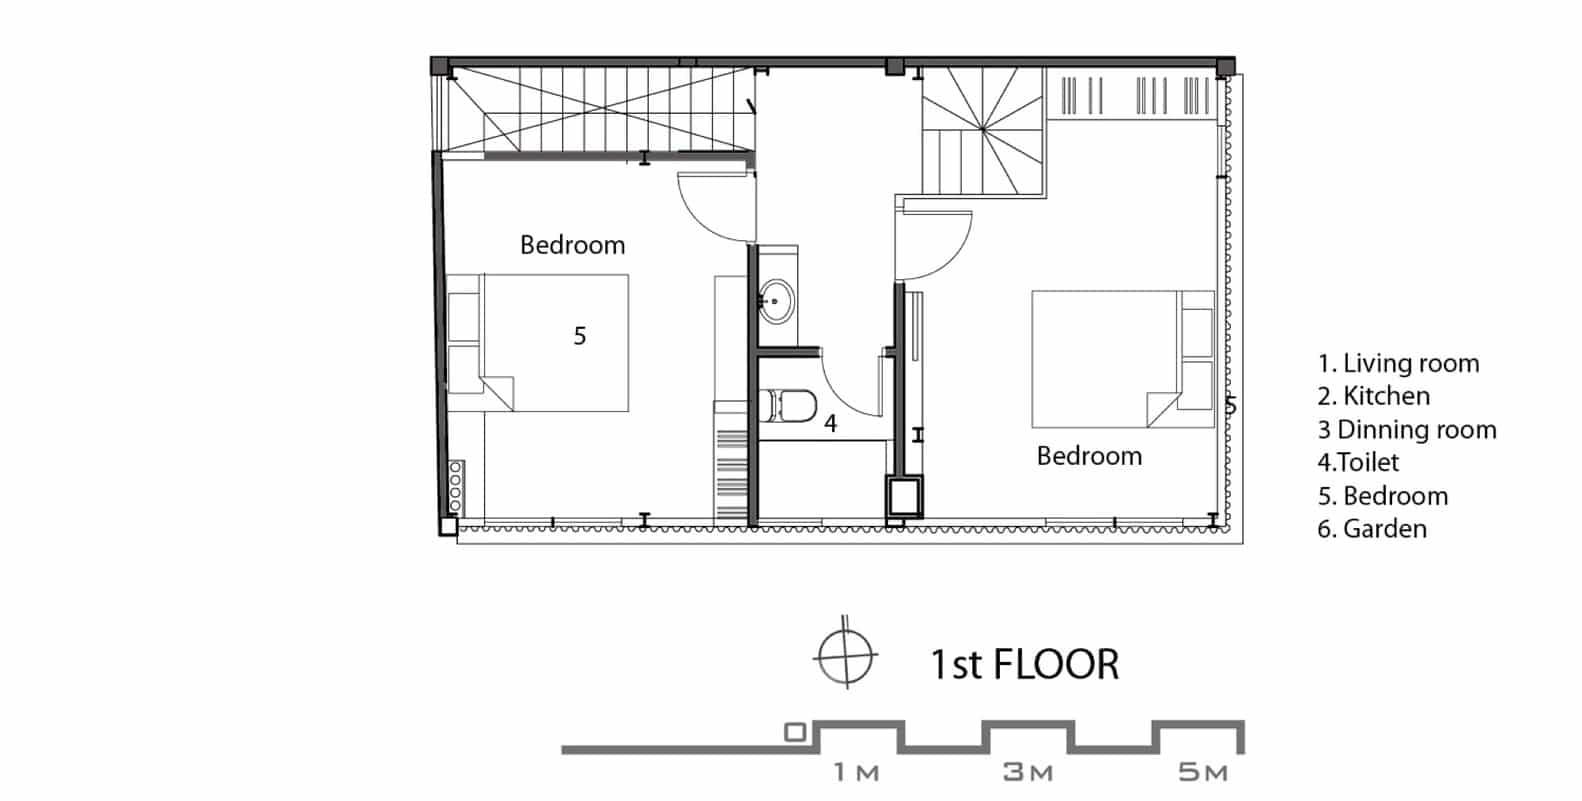 Casa econ mica moderna de 50 metros cuadrados construye - Planos de casas pareadas ...